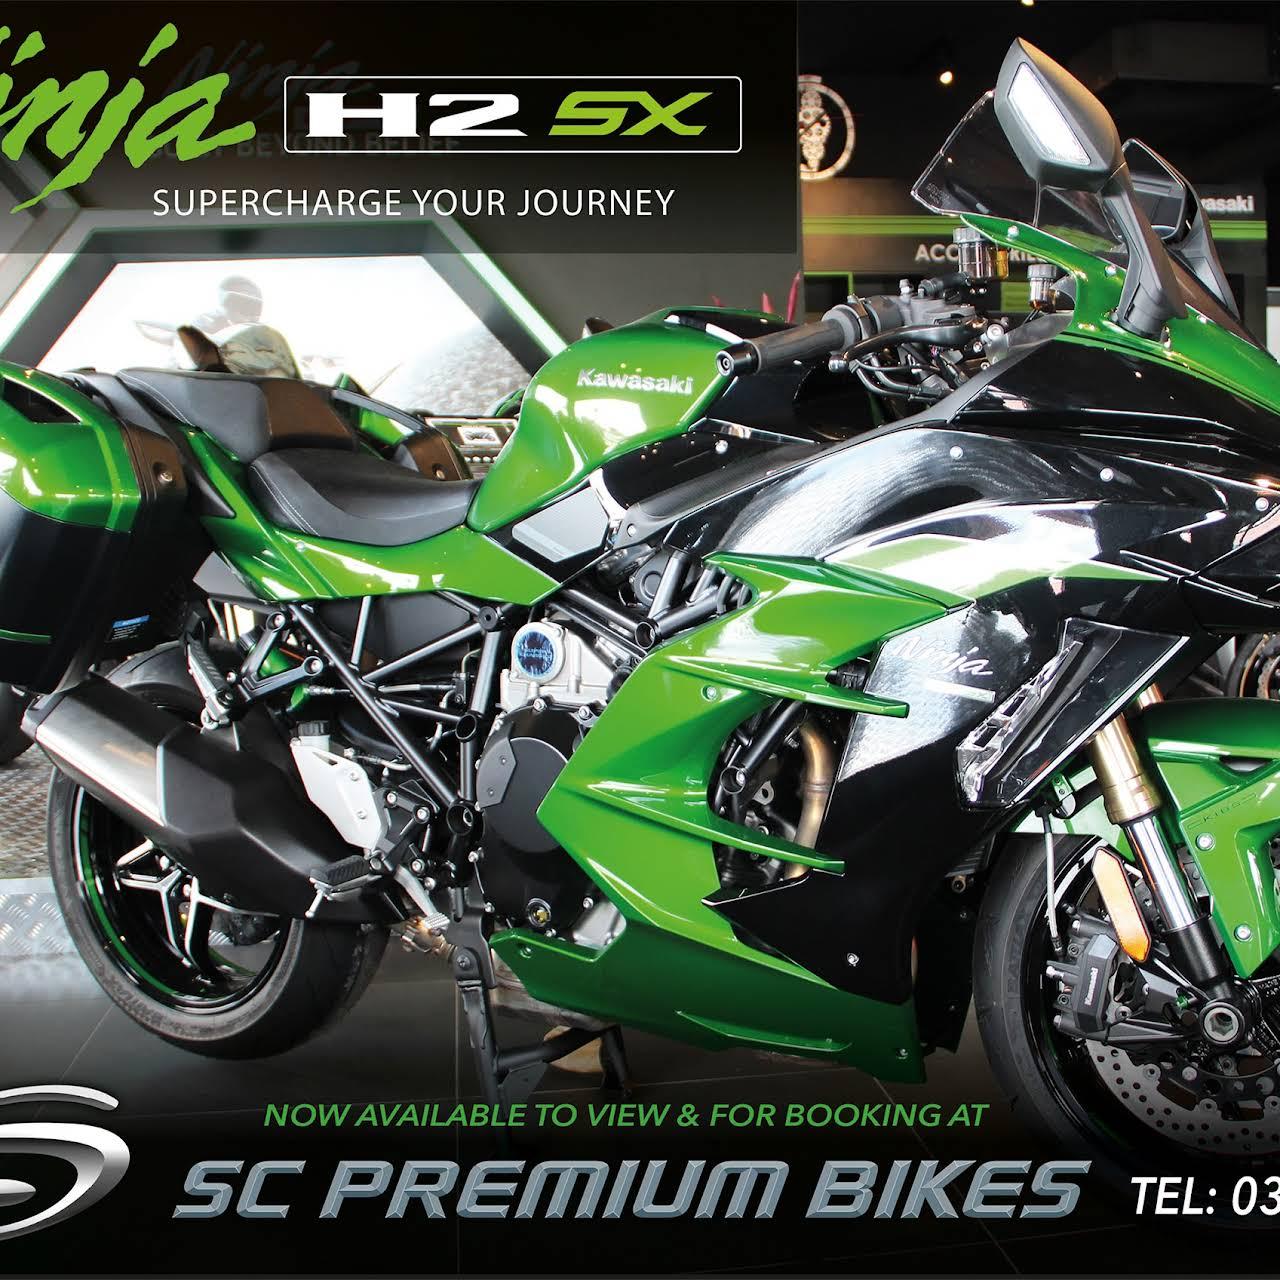 4763d339b2f SC Premium Bikes Sdn Bhd - Motorcycle Shop in Bandar Sunway